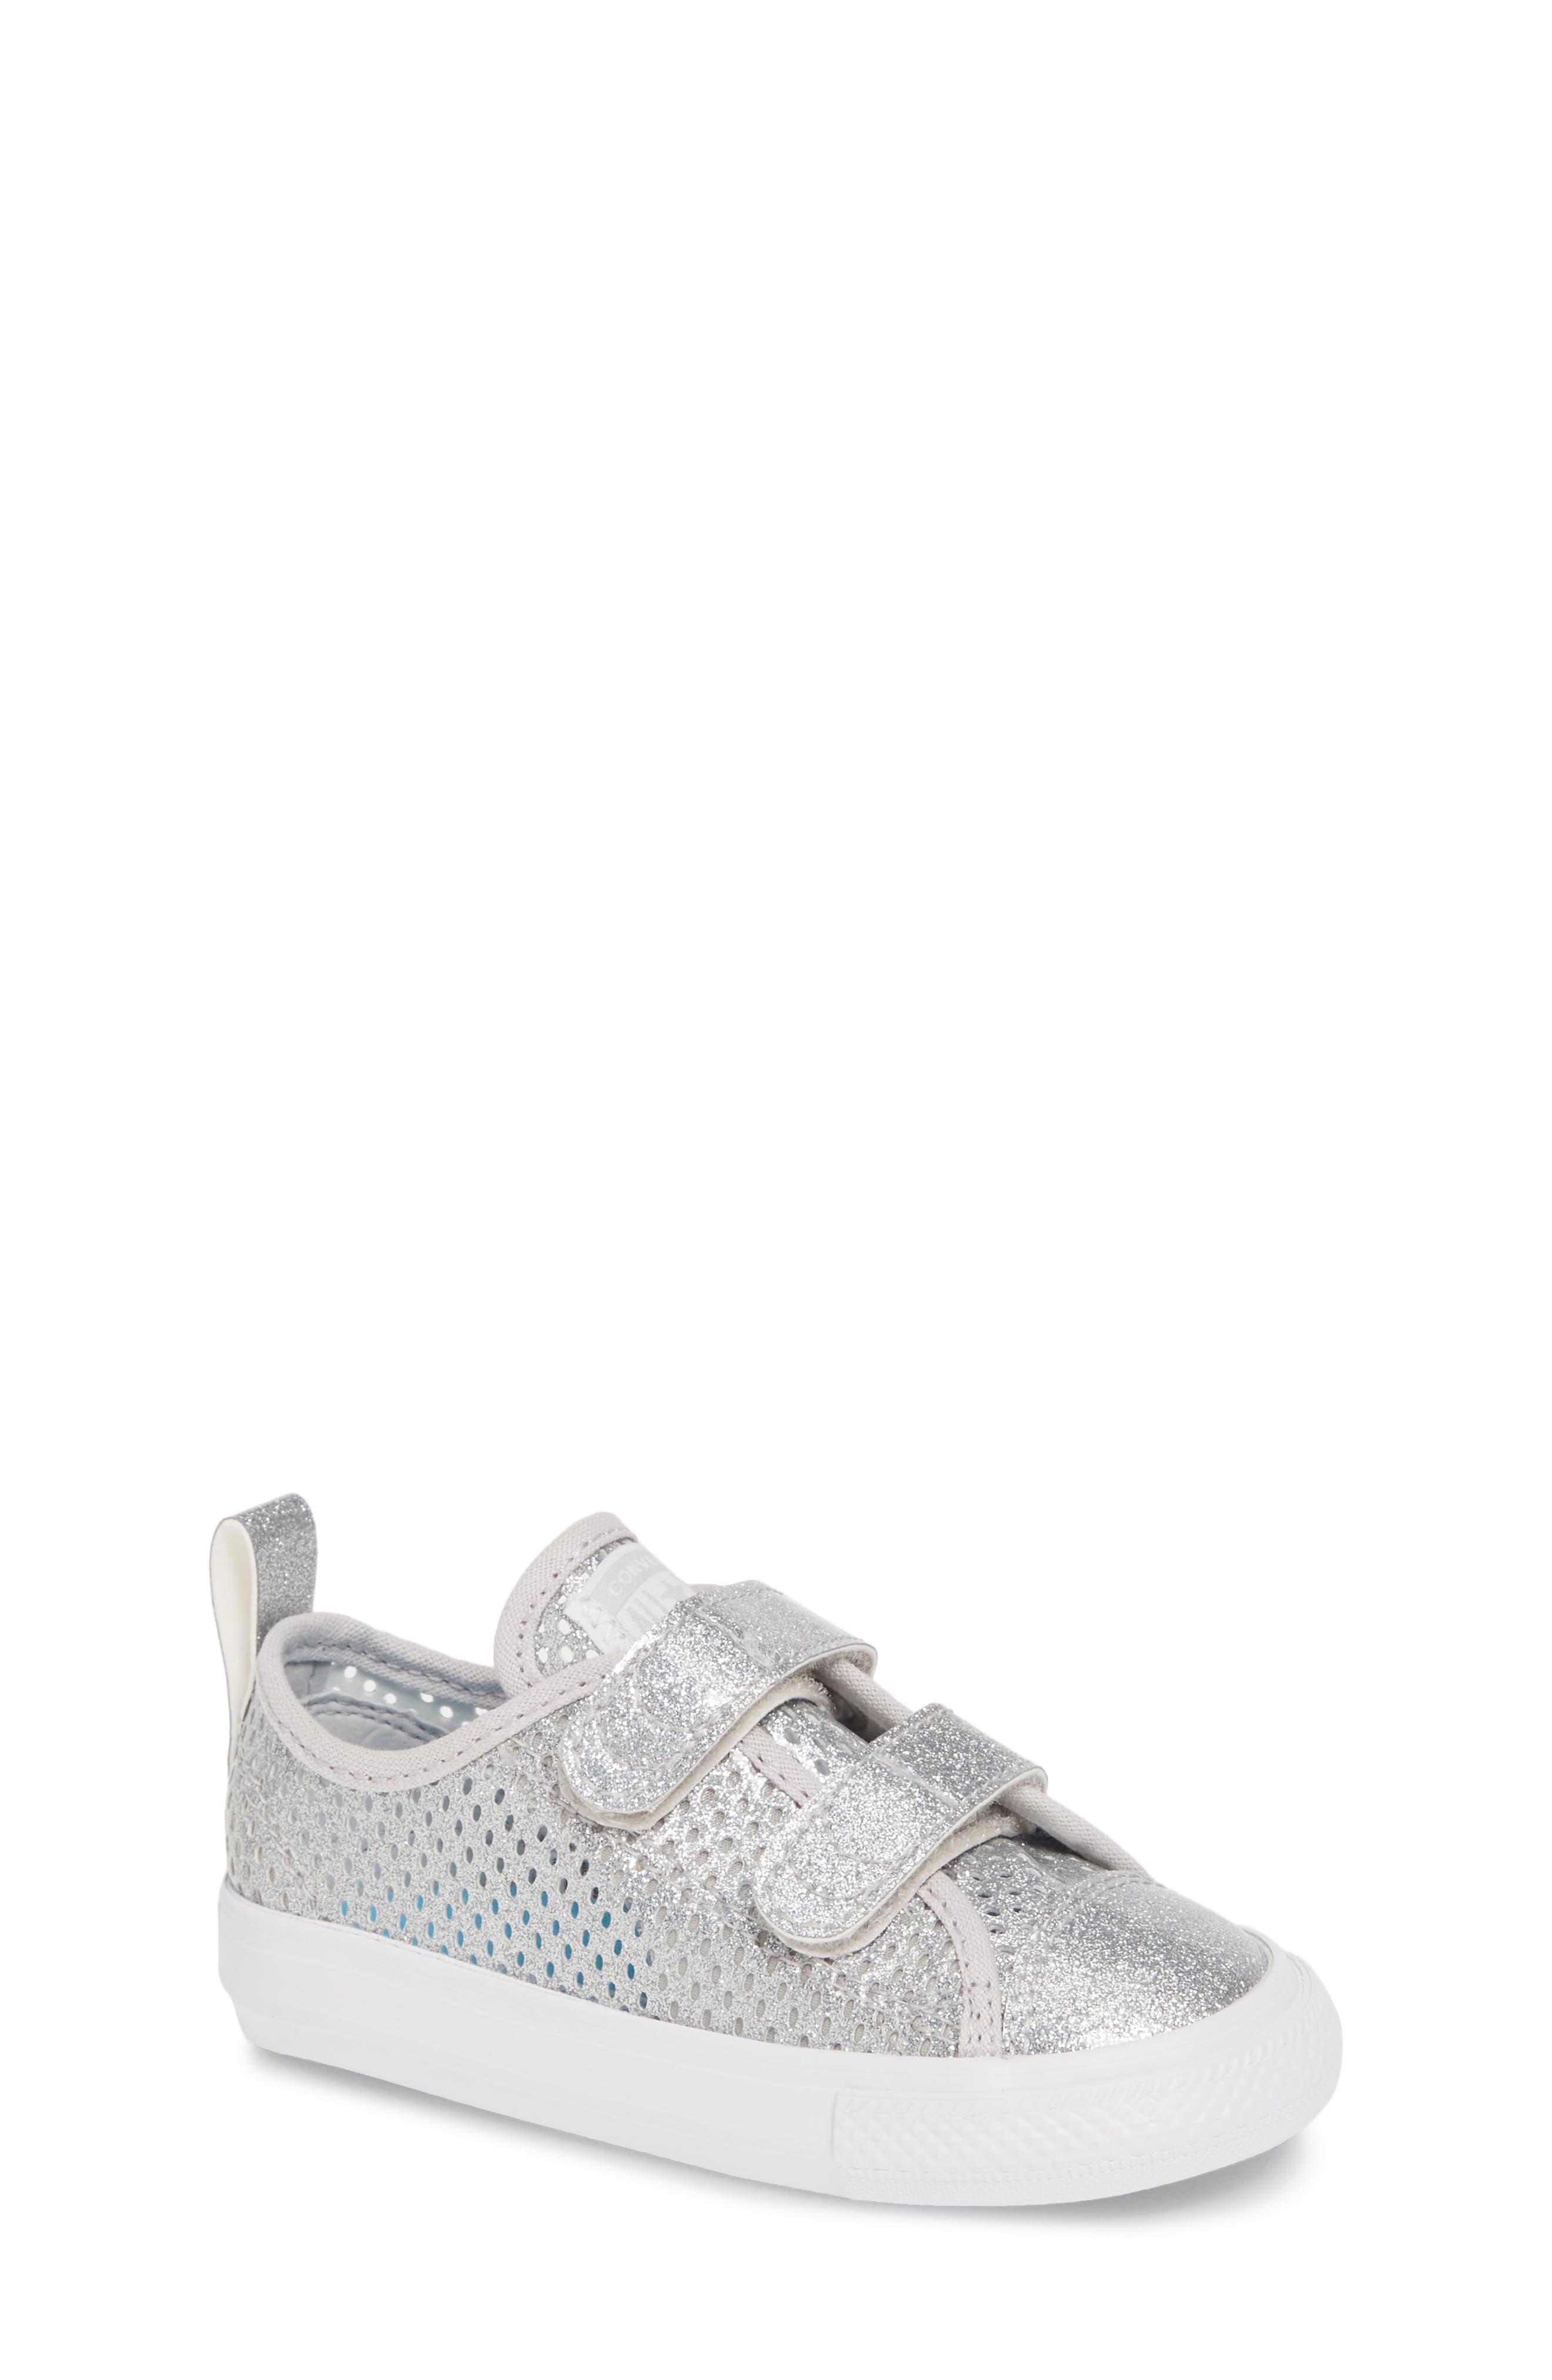 Converse Chuck Taylor All Star 2V Glitter Mesh Sneaker